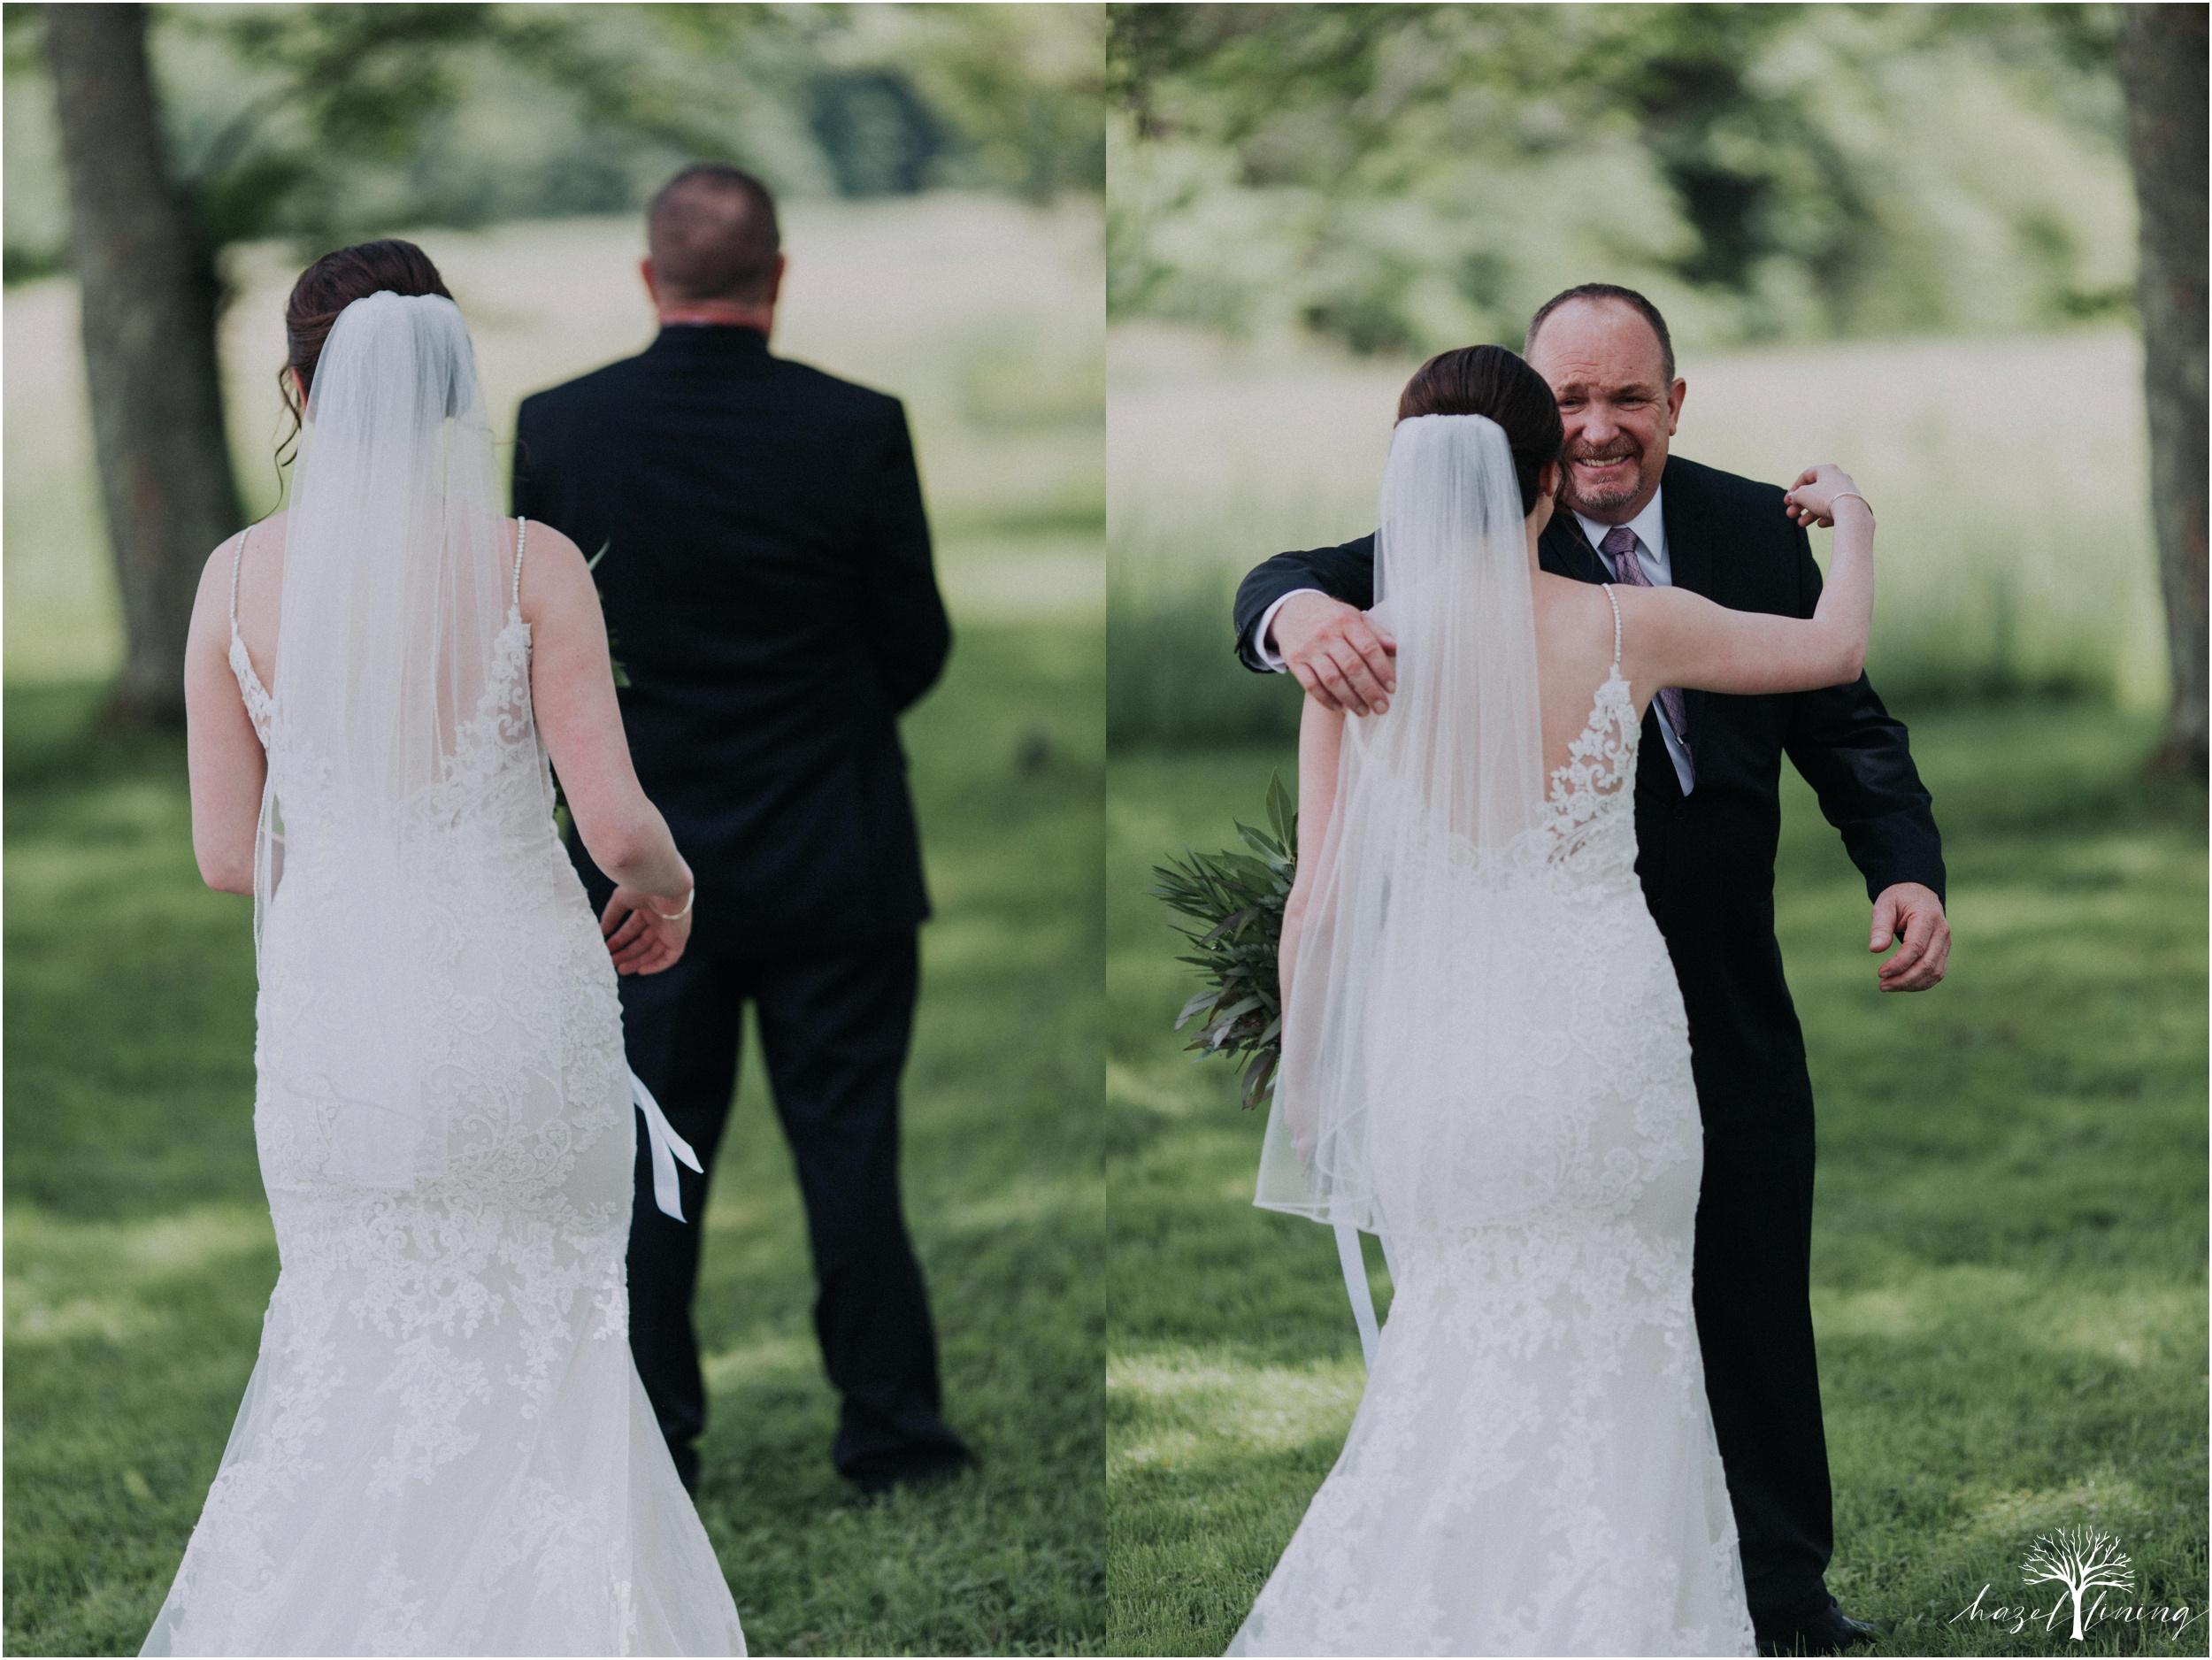 hazel-lining-travel-wedding-elopement-photography-lisa-landon-shoemaker-the-farm-bakery-and-events-bucks-county-quakertown-pennsylvania-summer-country-outdoor-farm-wedding_0021.jpg